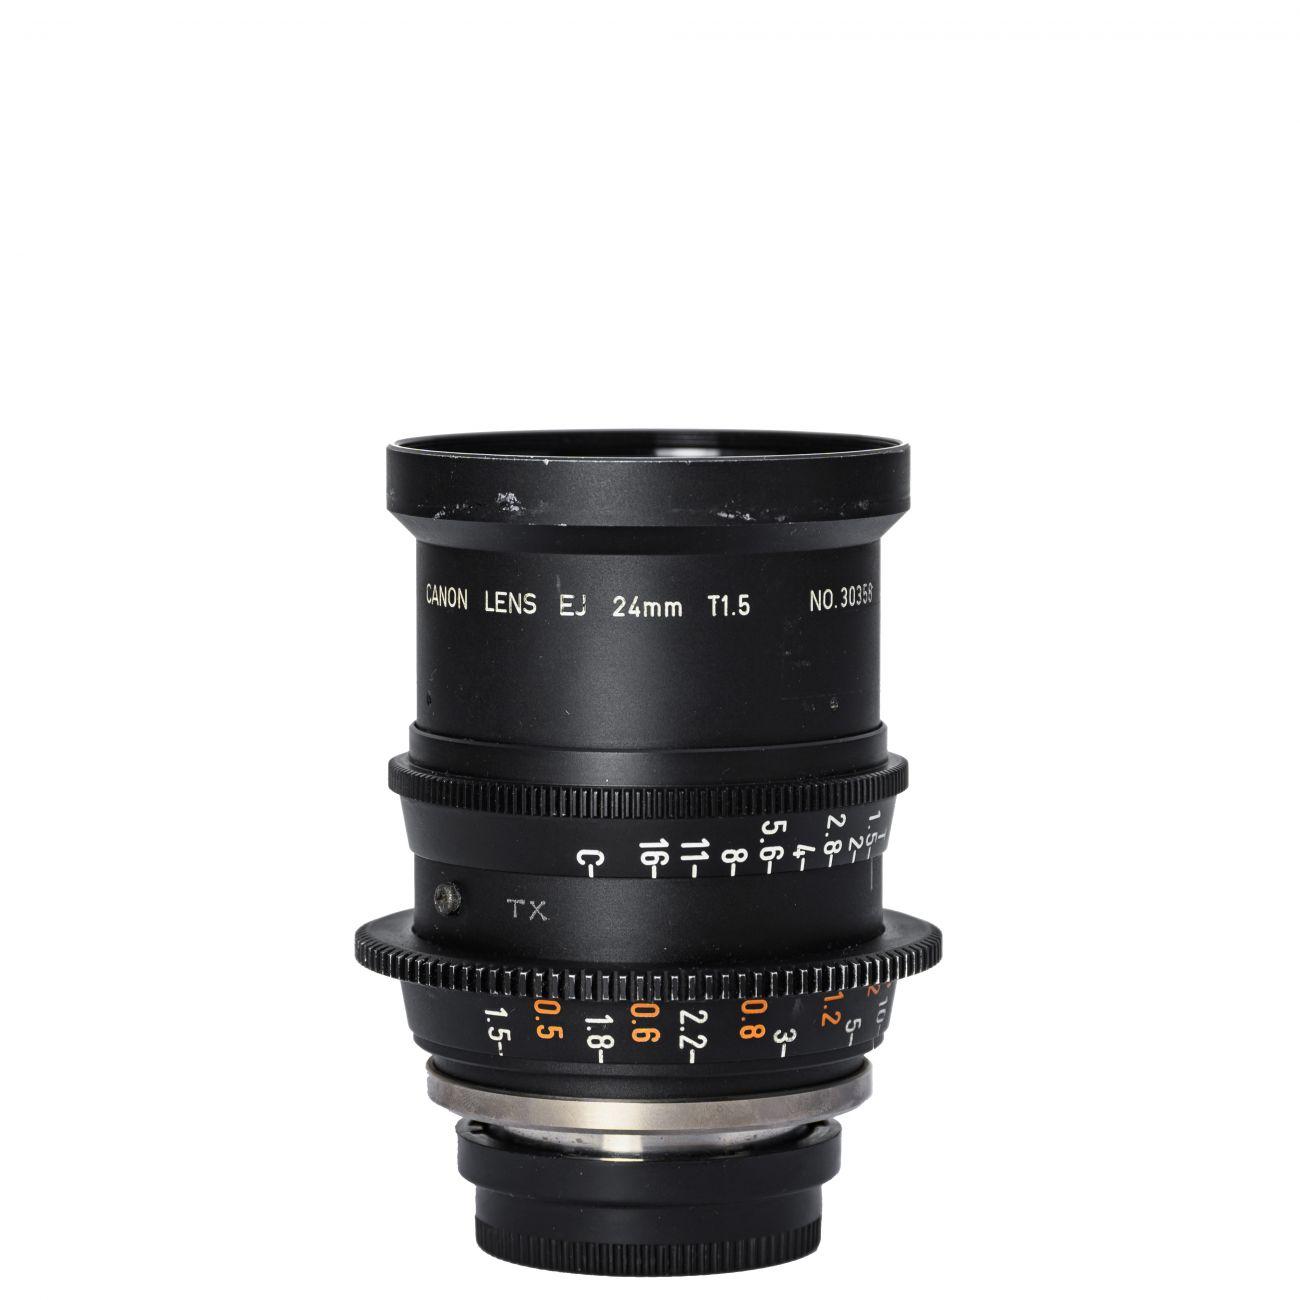 24mm lens Canon EJ T1.5 B4-mount